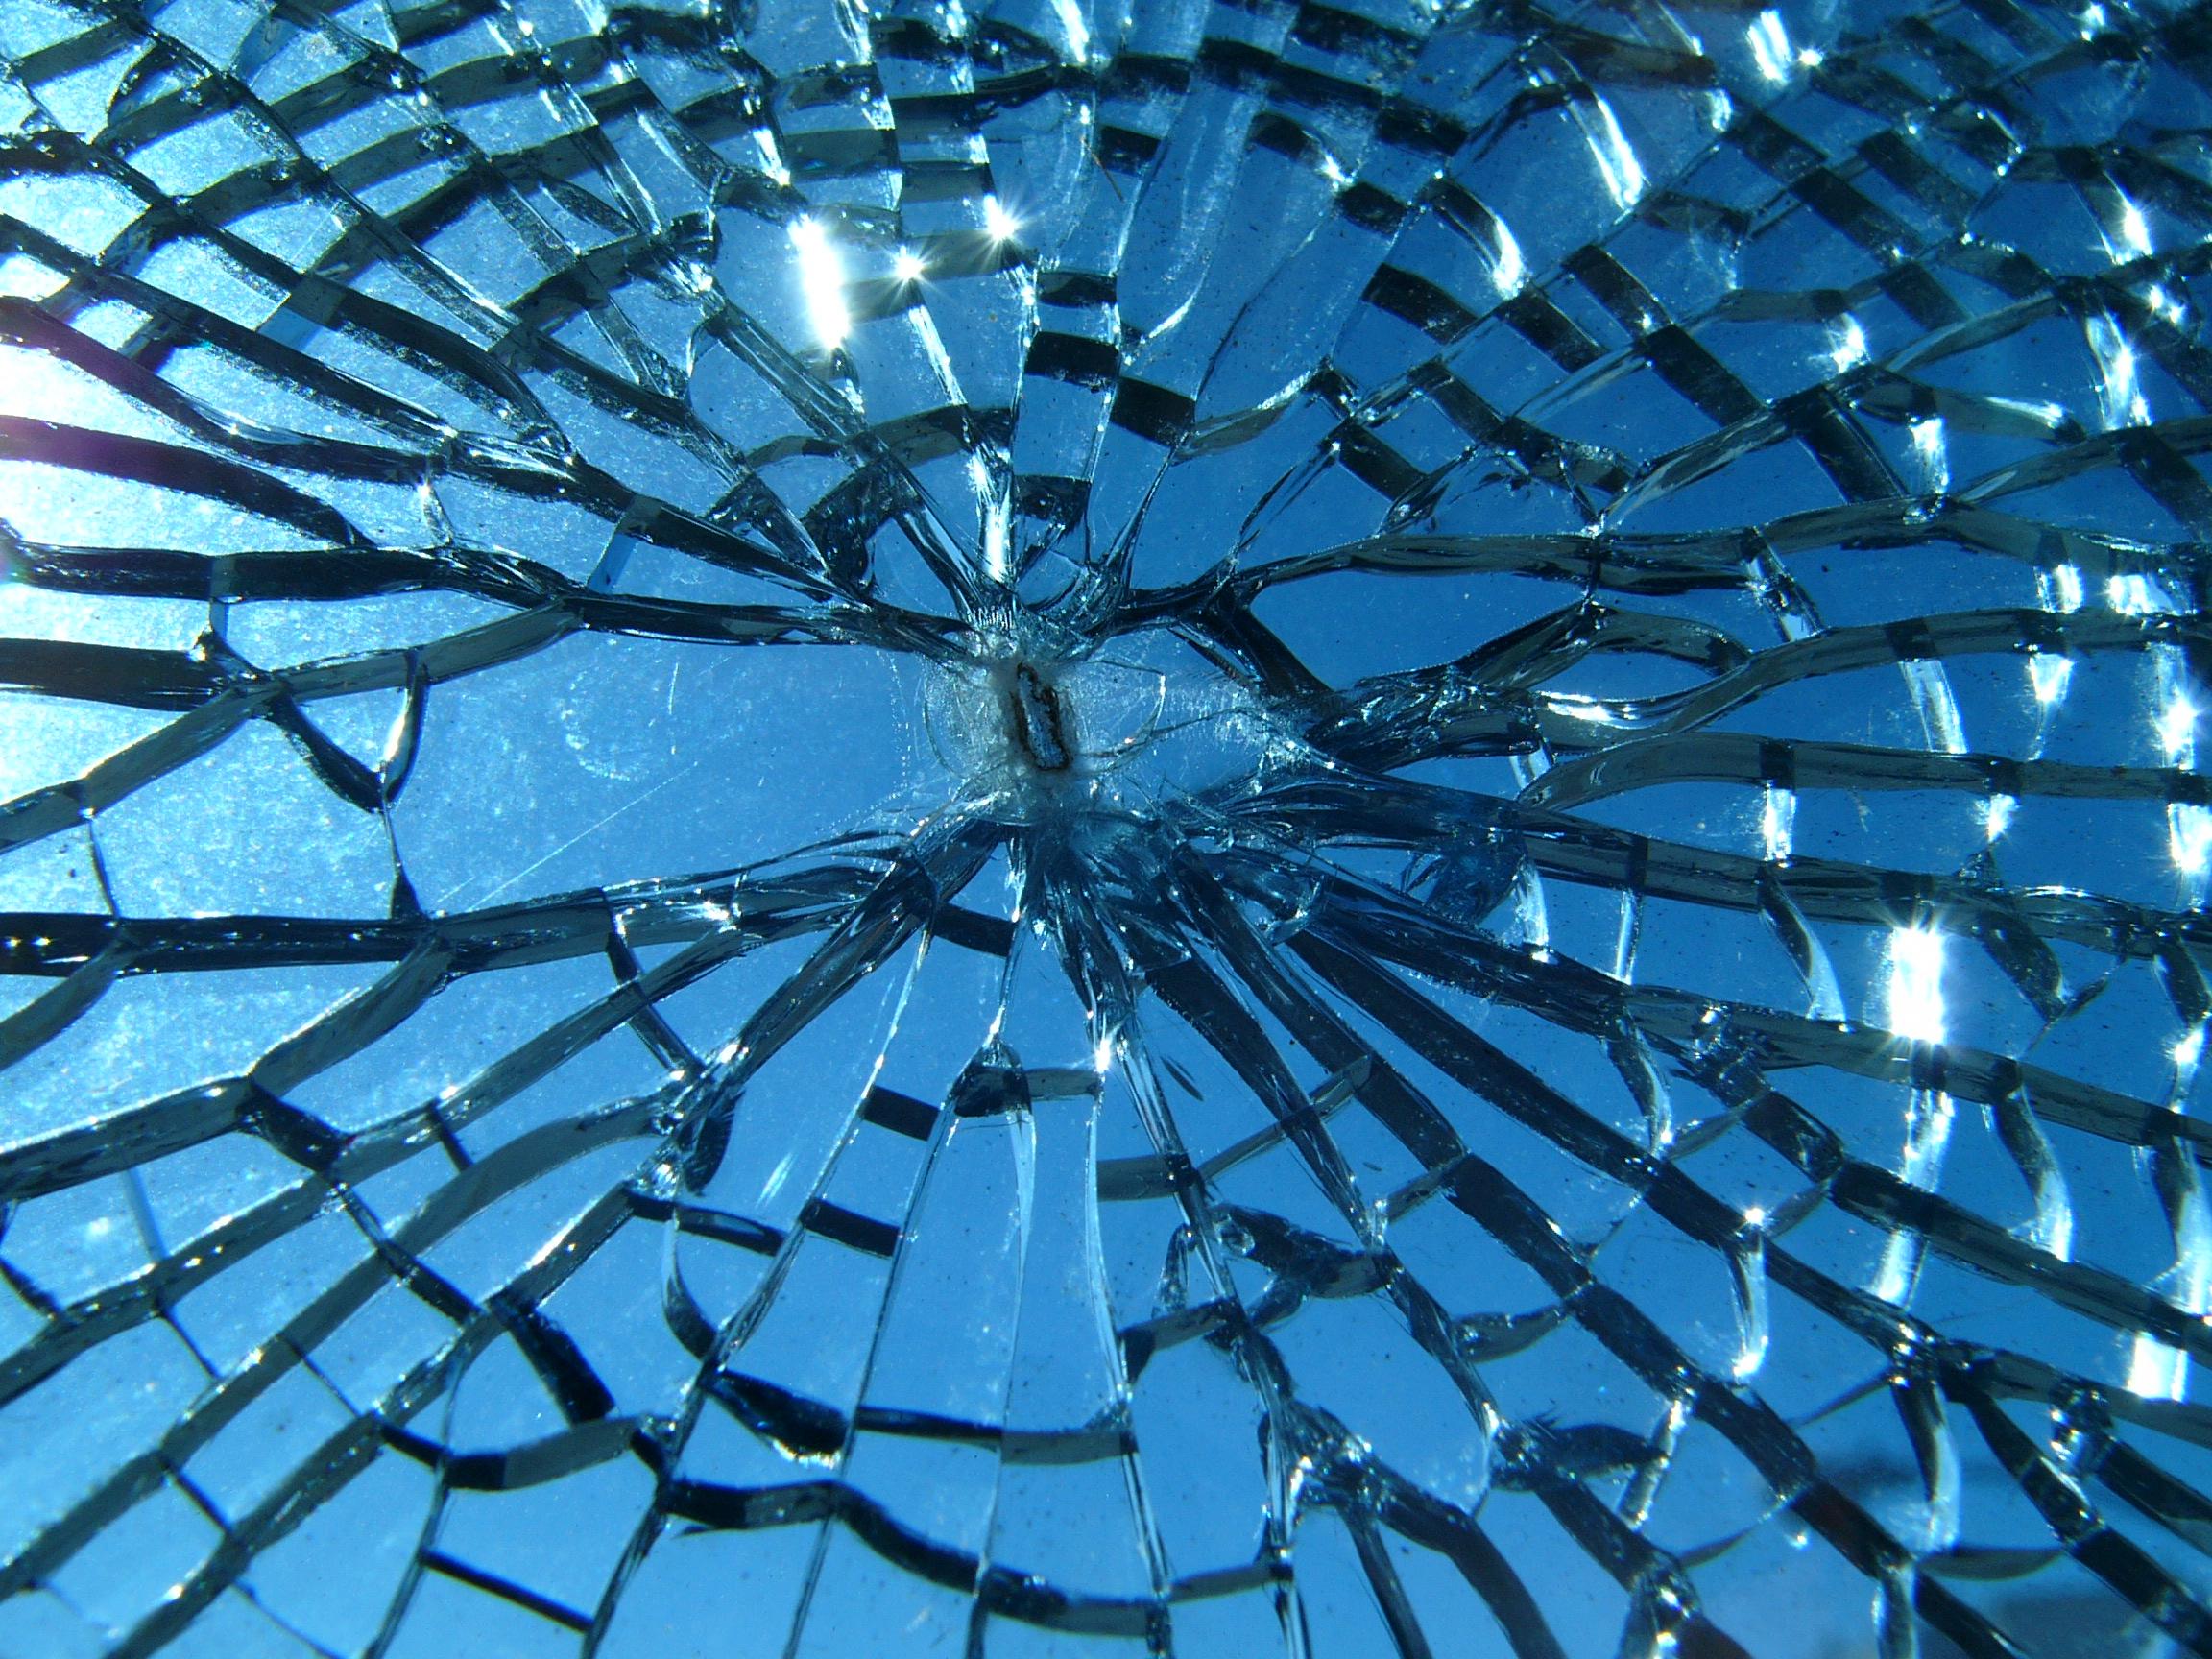 File:Broken glass.jpg - Wikimedia Commons